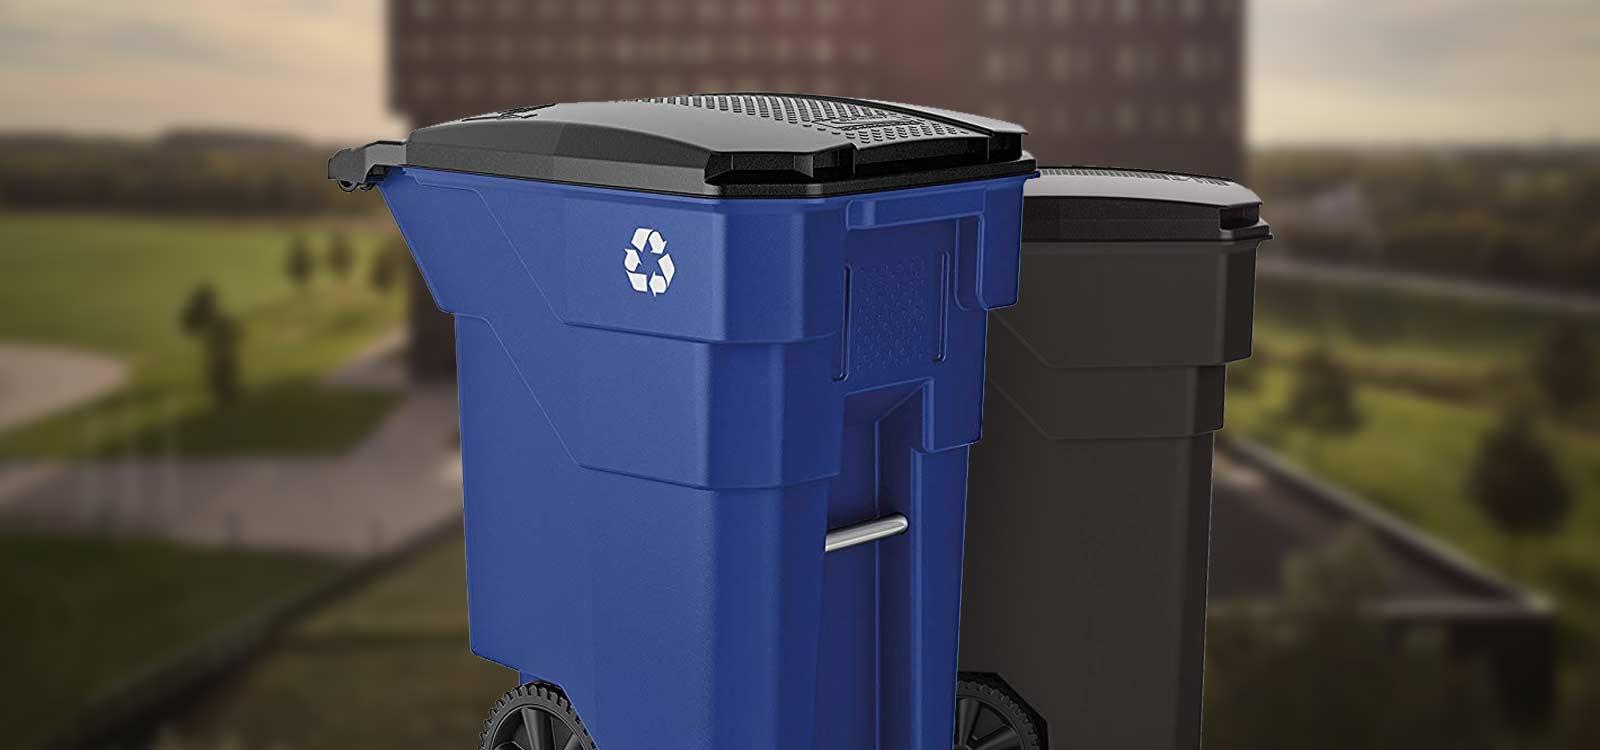 rolcontainer-afval-minicontainer-kliko-bedrijfsafval-wielen